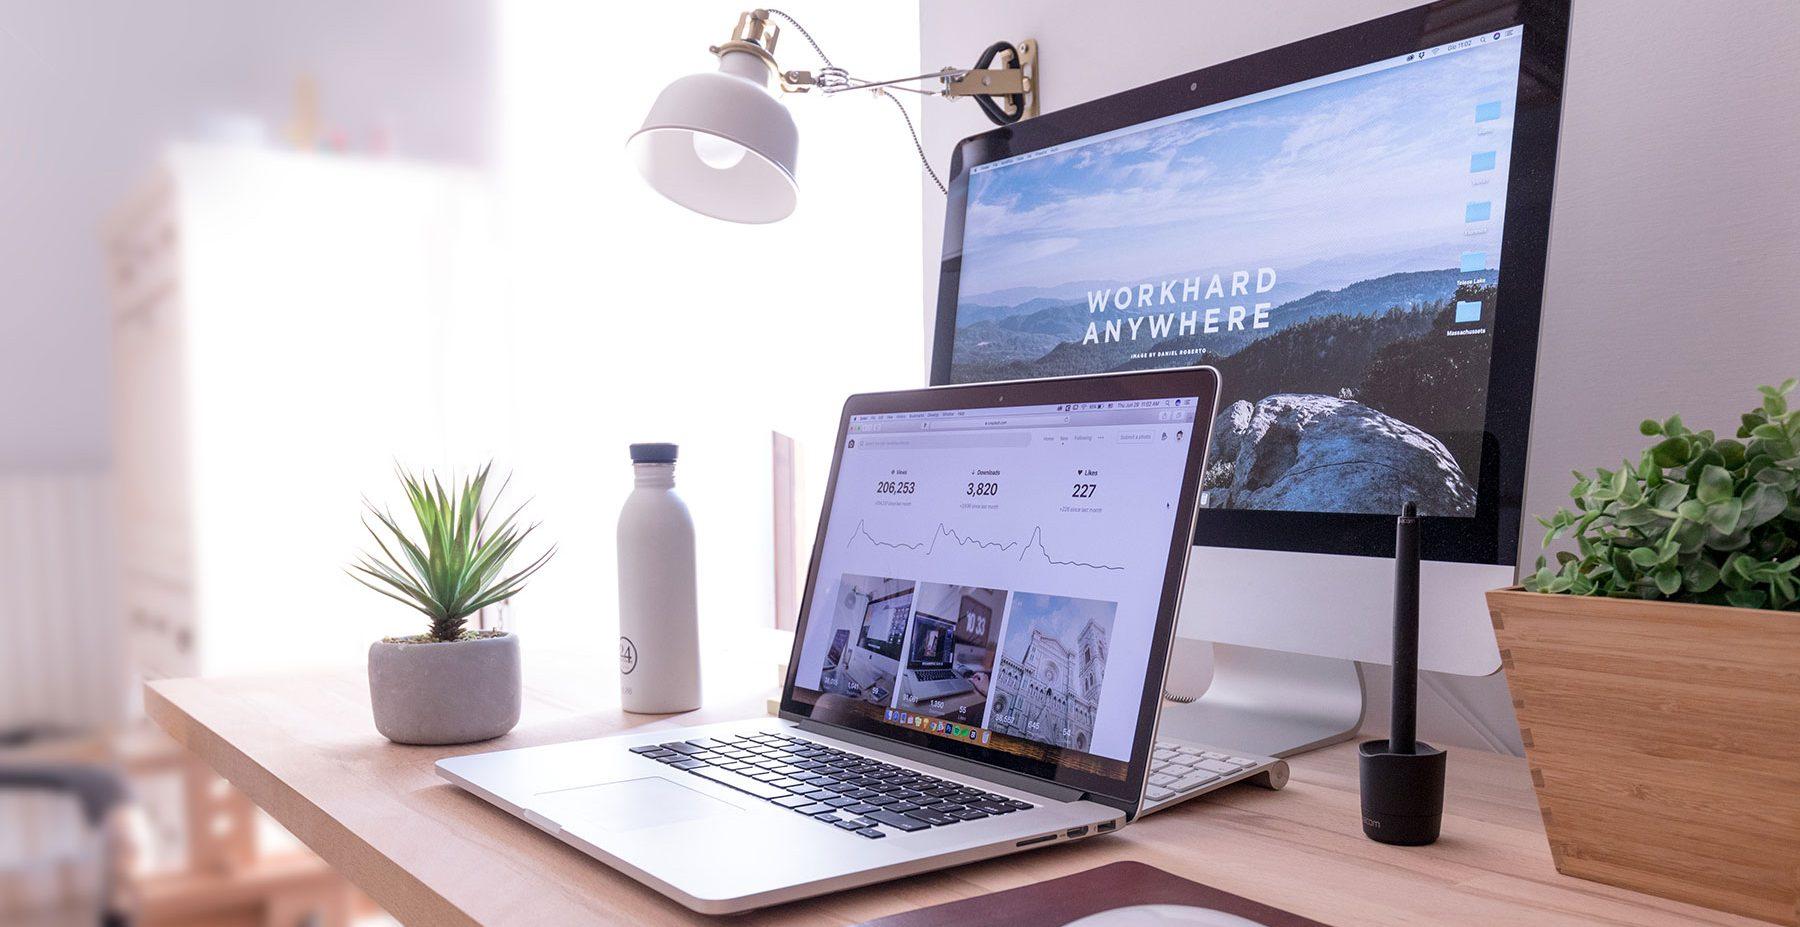 Web Hosting - Ace Web Studio